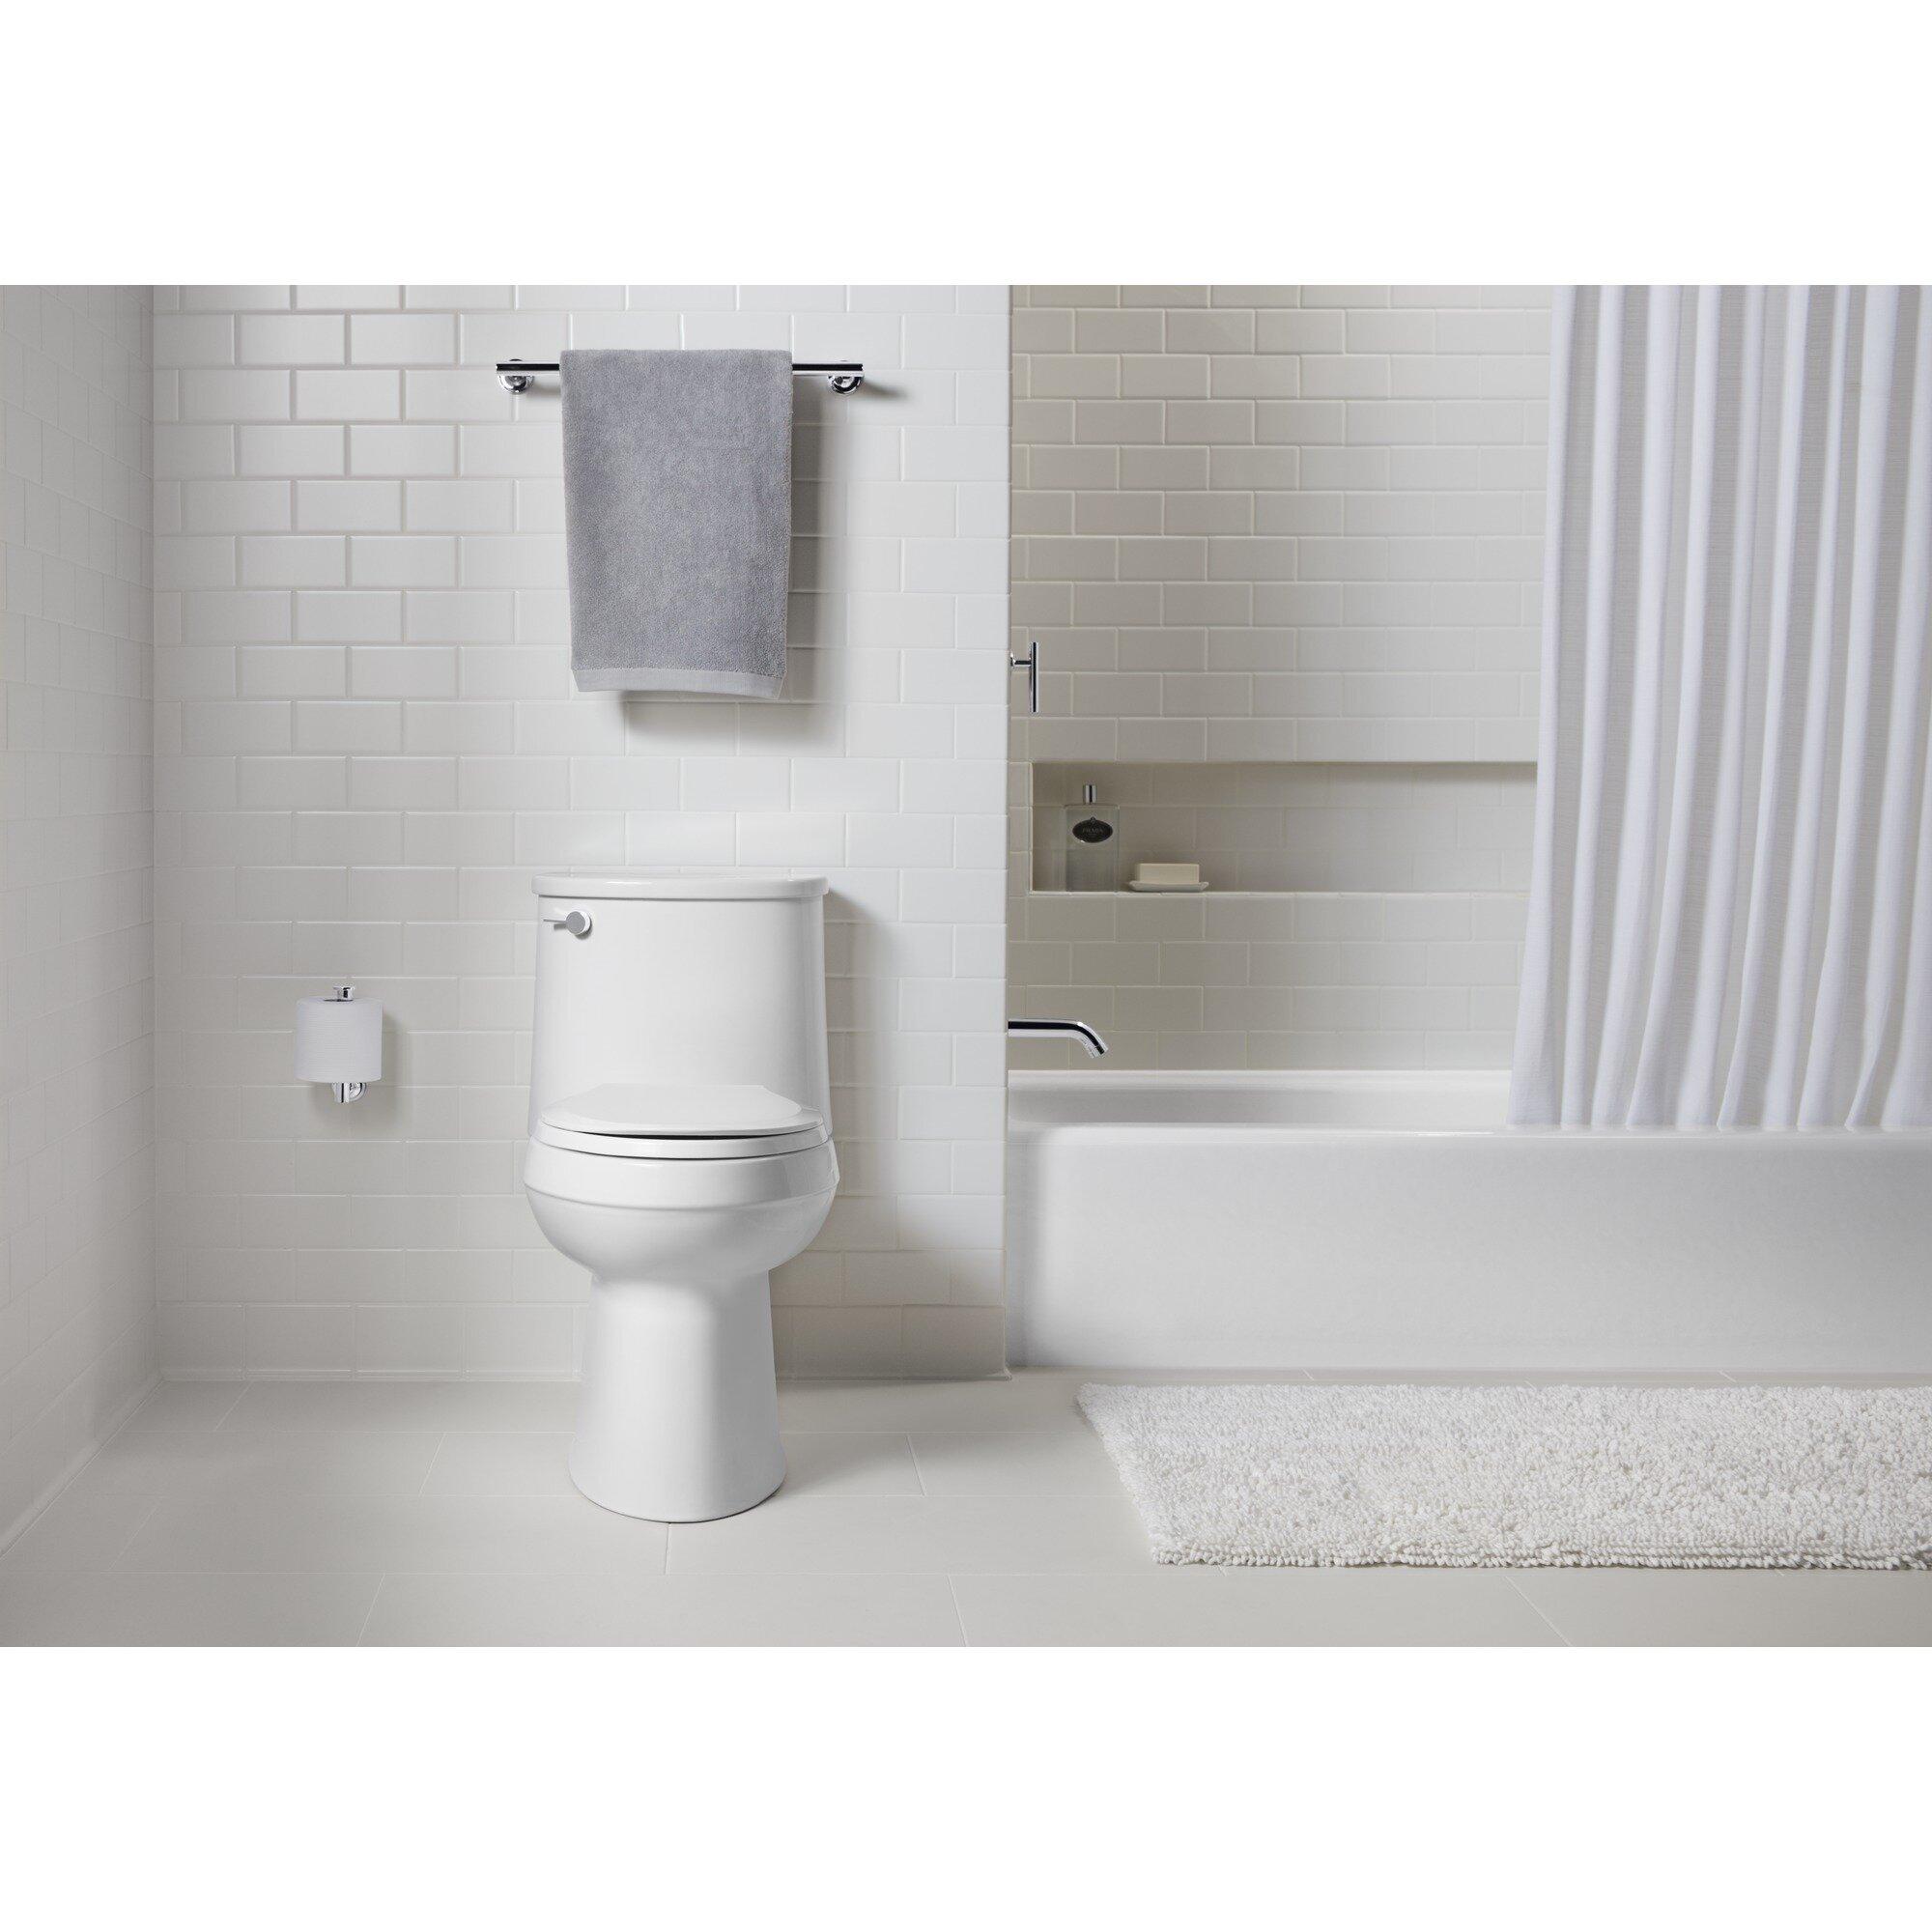 K 837 0 Kohler Bellwether Raphael 60 X 30 Bath With Integral A Reviews Wayfair